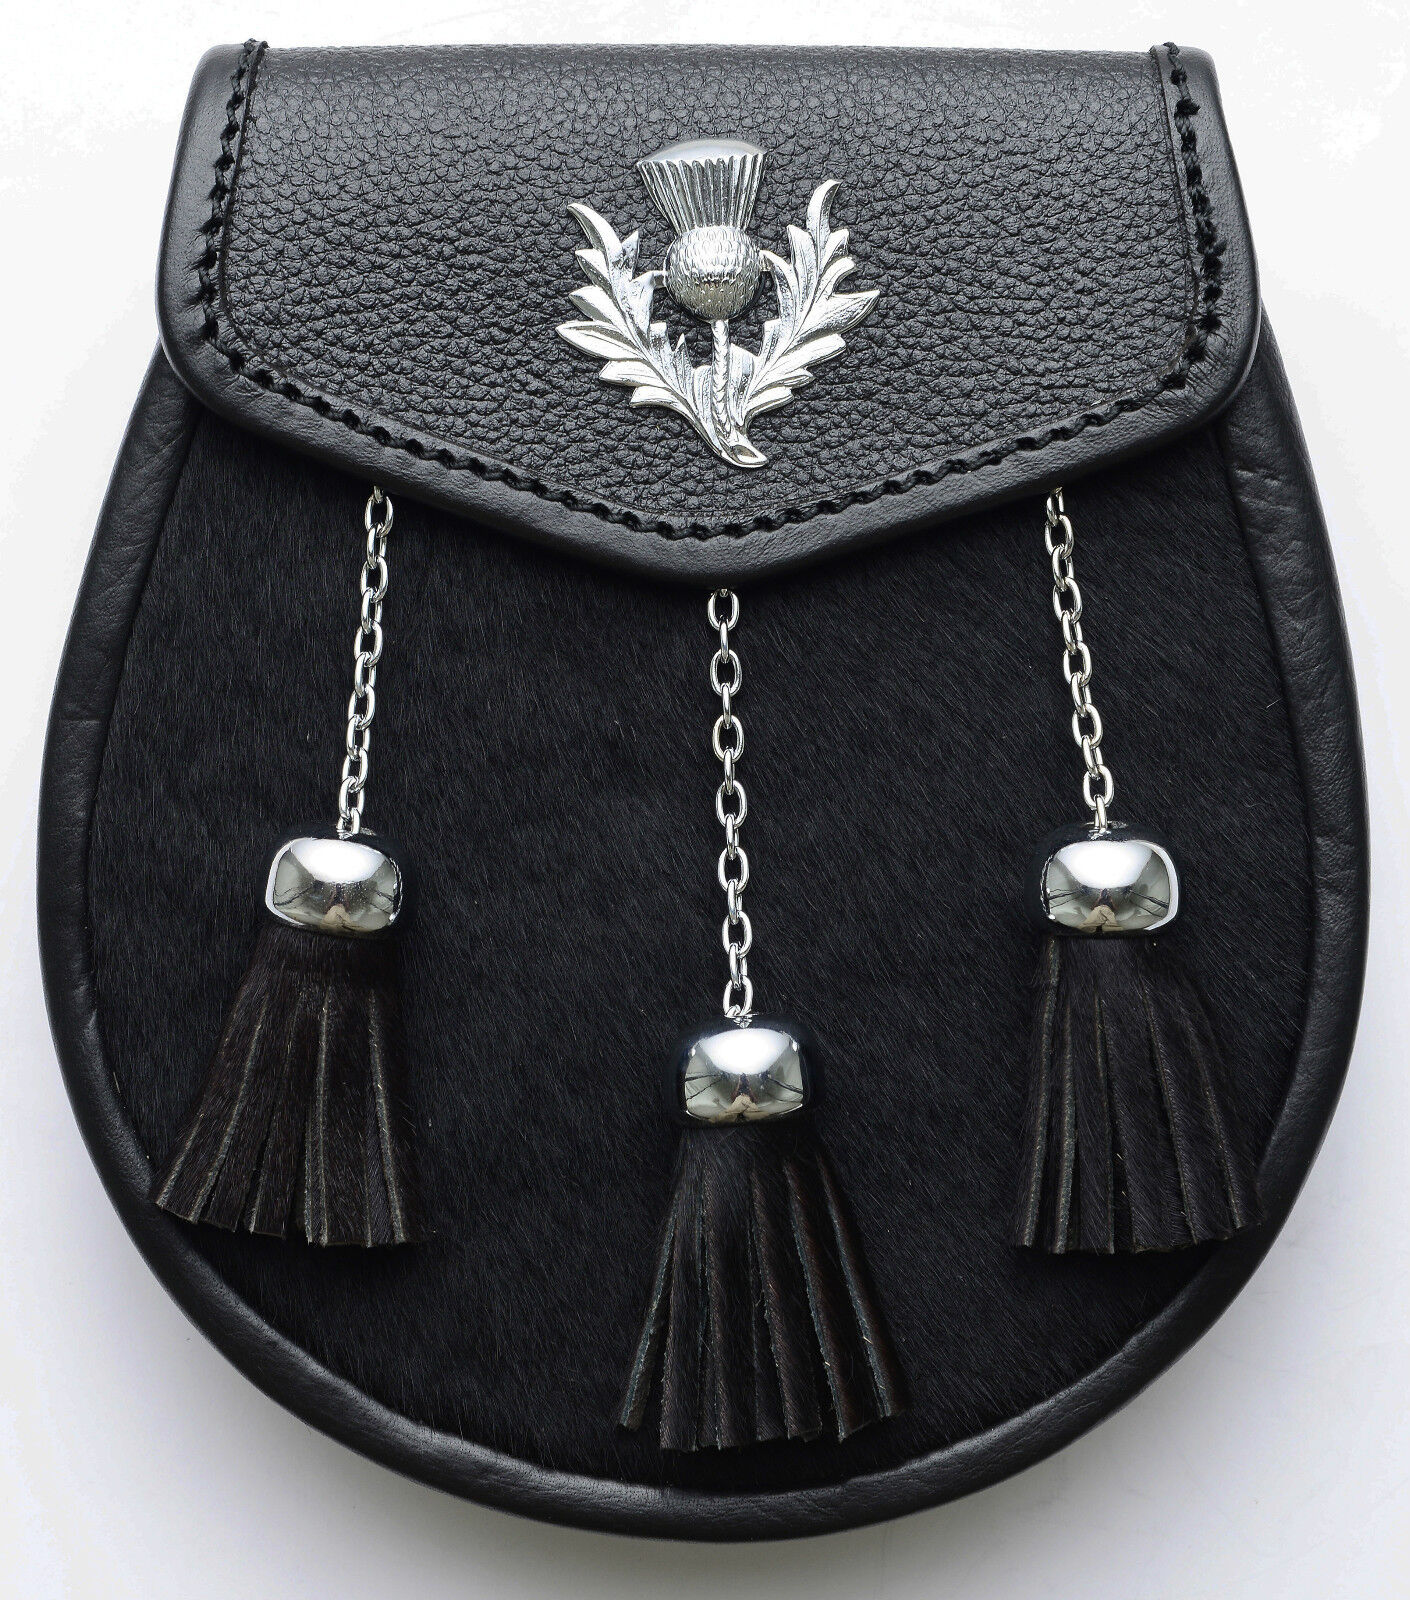 Black Calf skin Thistle Leather Sporran Tradtional Scottish Wallet Kilts